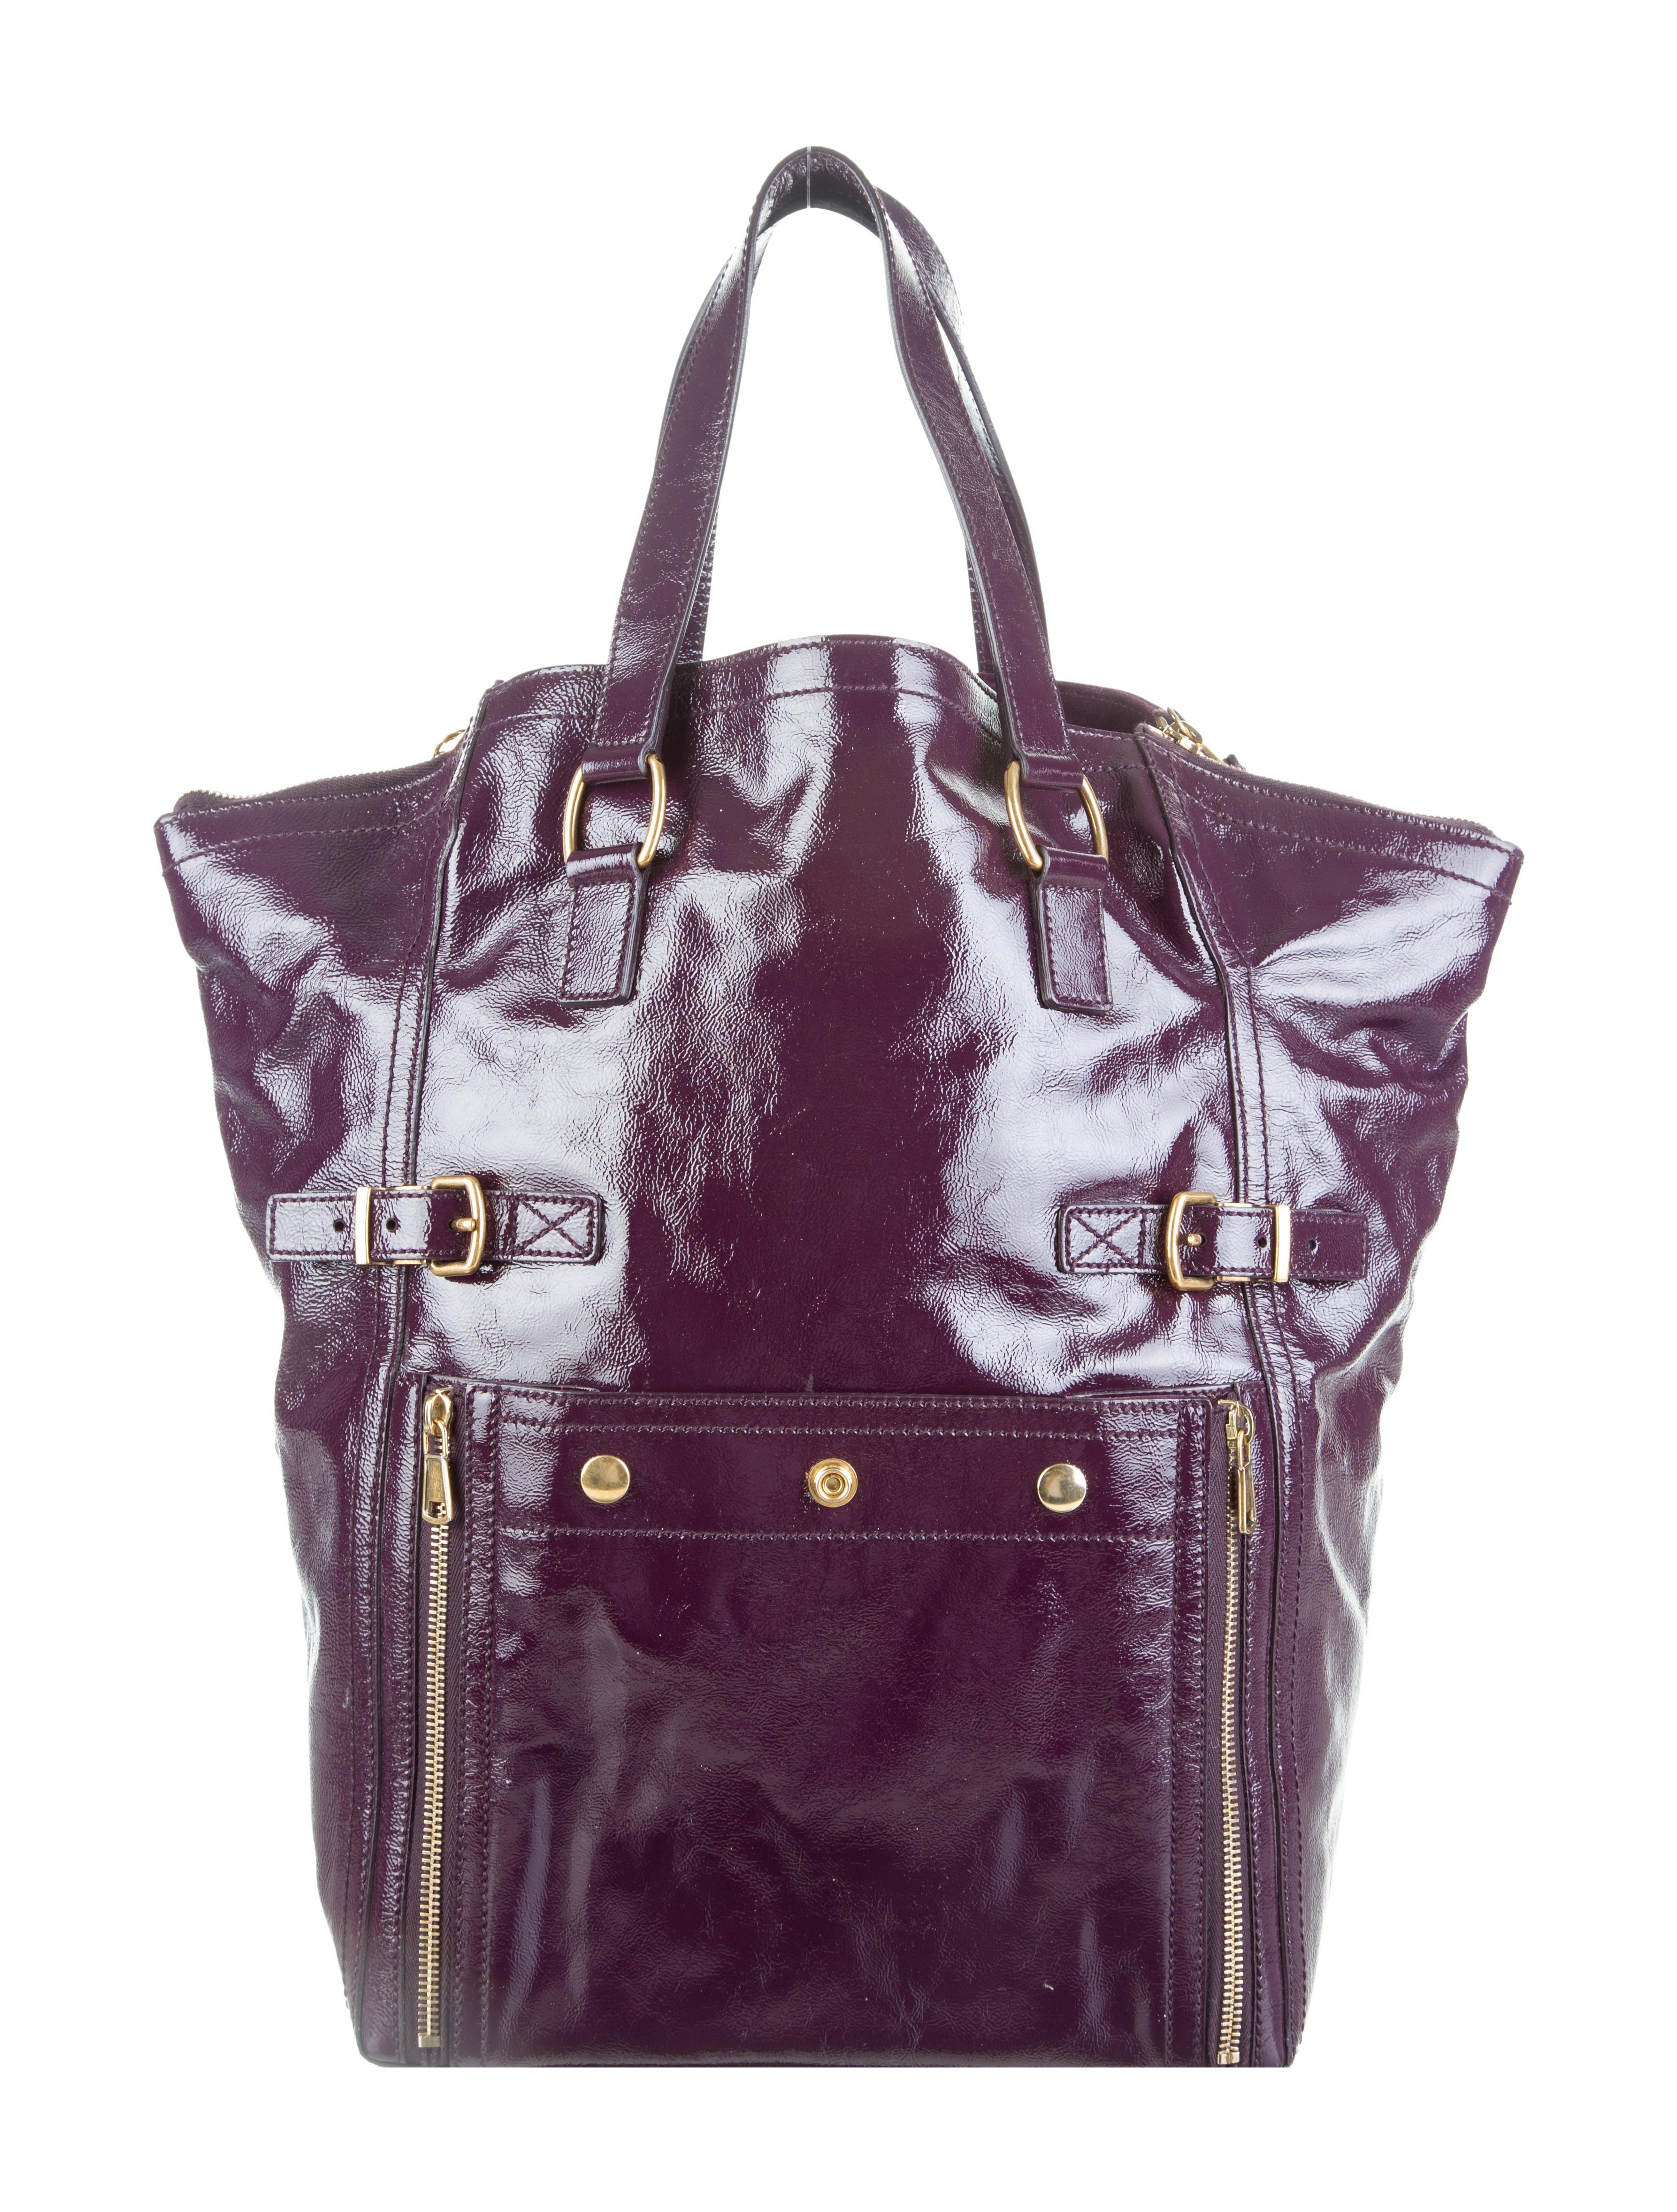 Yves Saint Laurent Downtown Tote - Handbags - YVE36000 | The RealReal